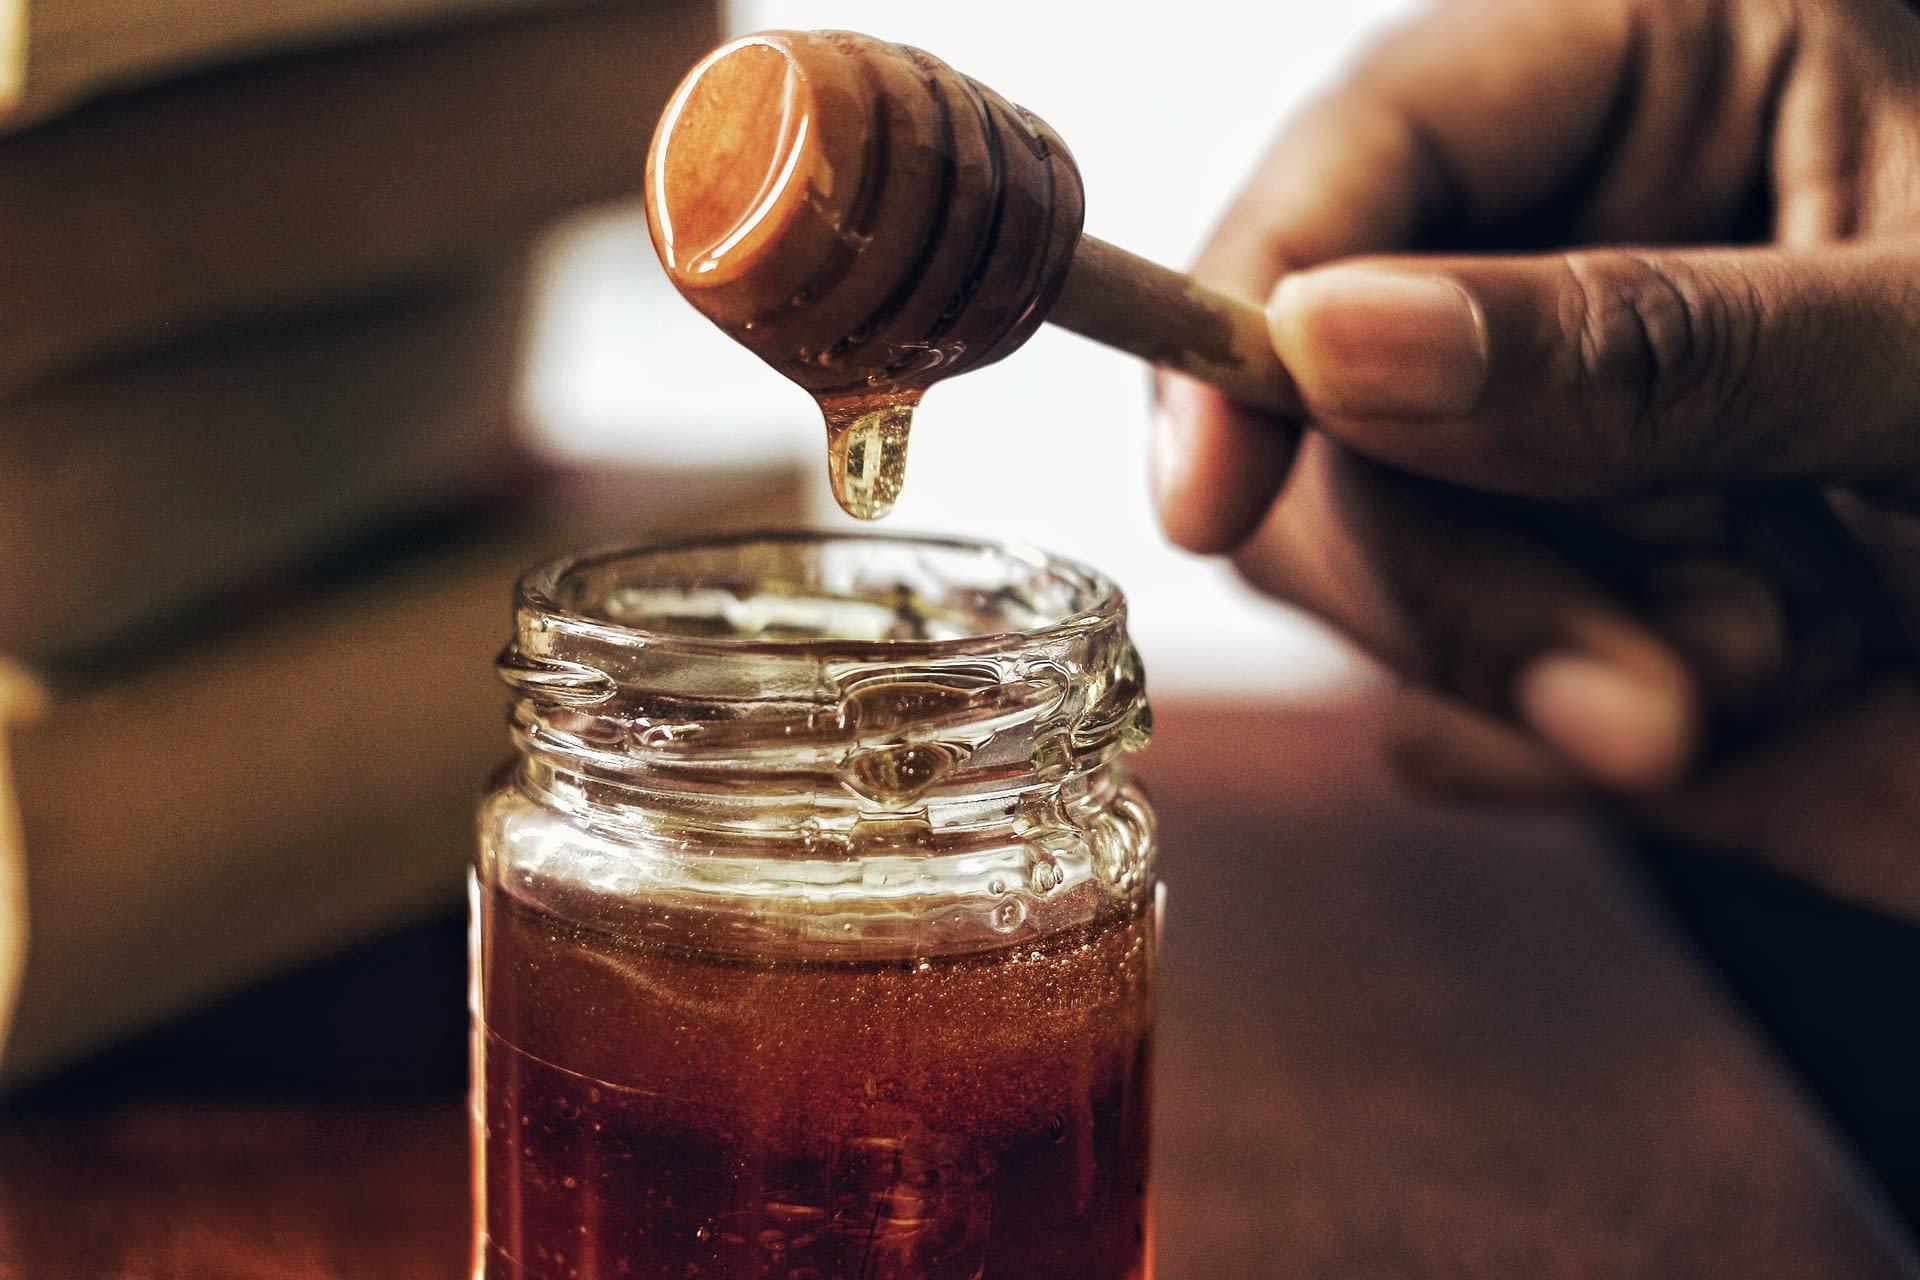 How to store honey